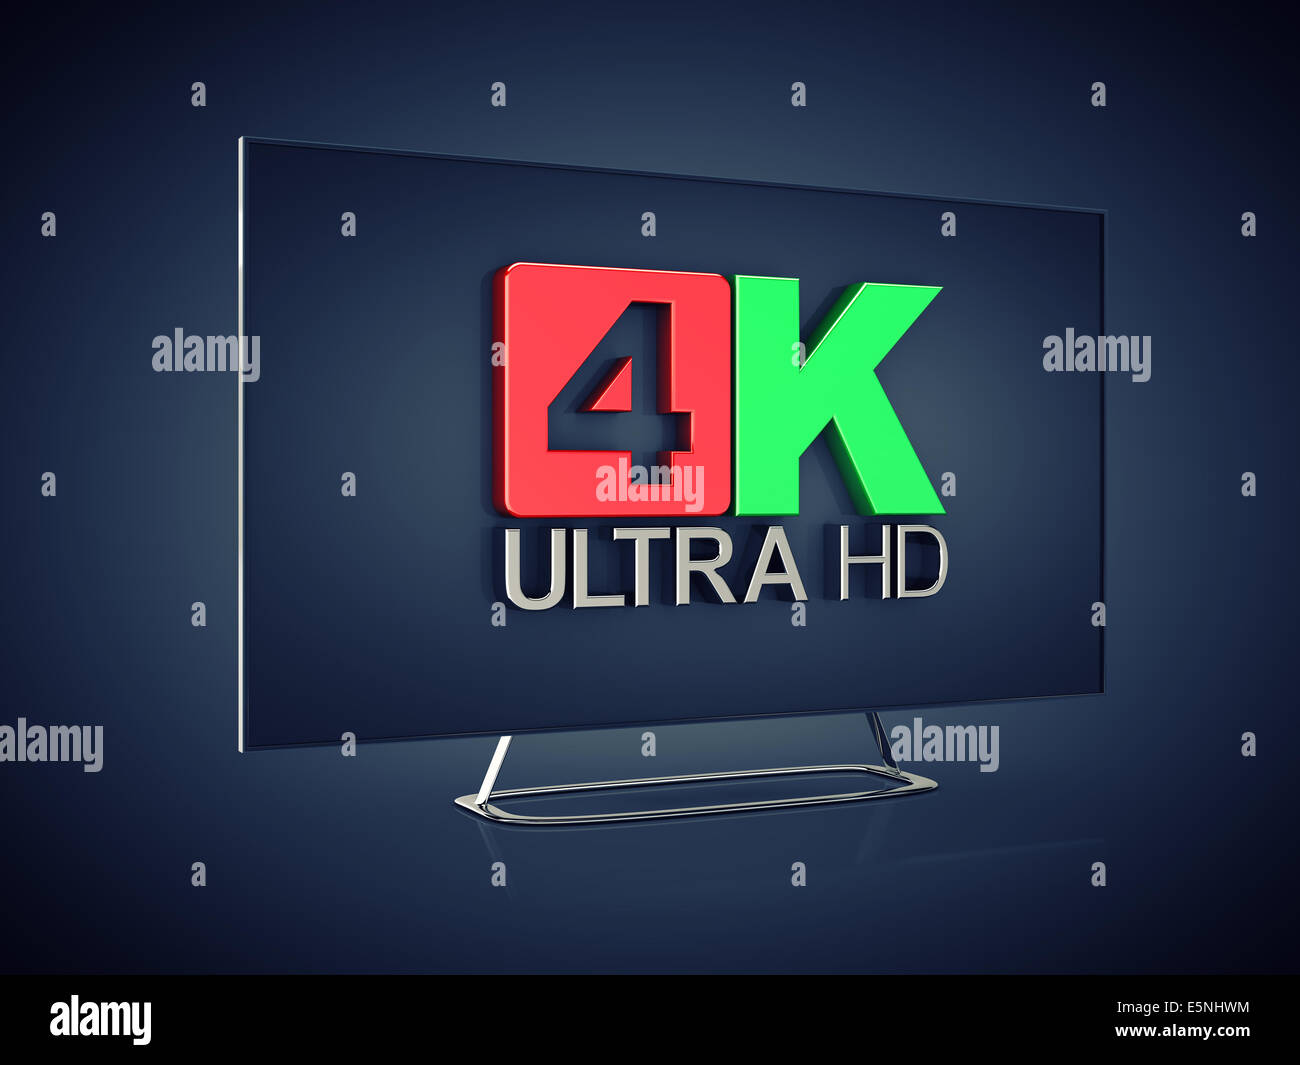 4K Ultra HD screen tv on dark background , Ultra High Definition display - Stock Image